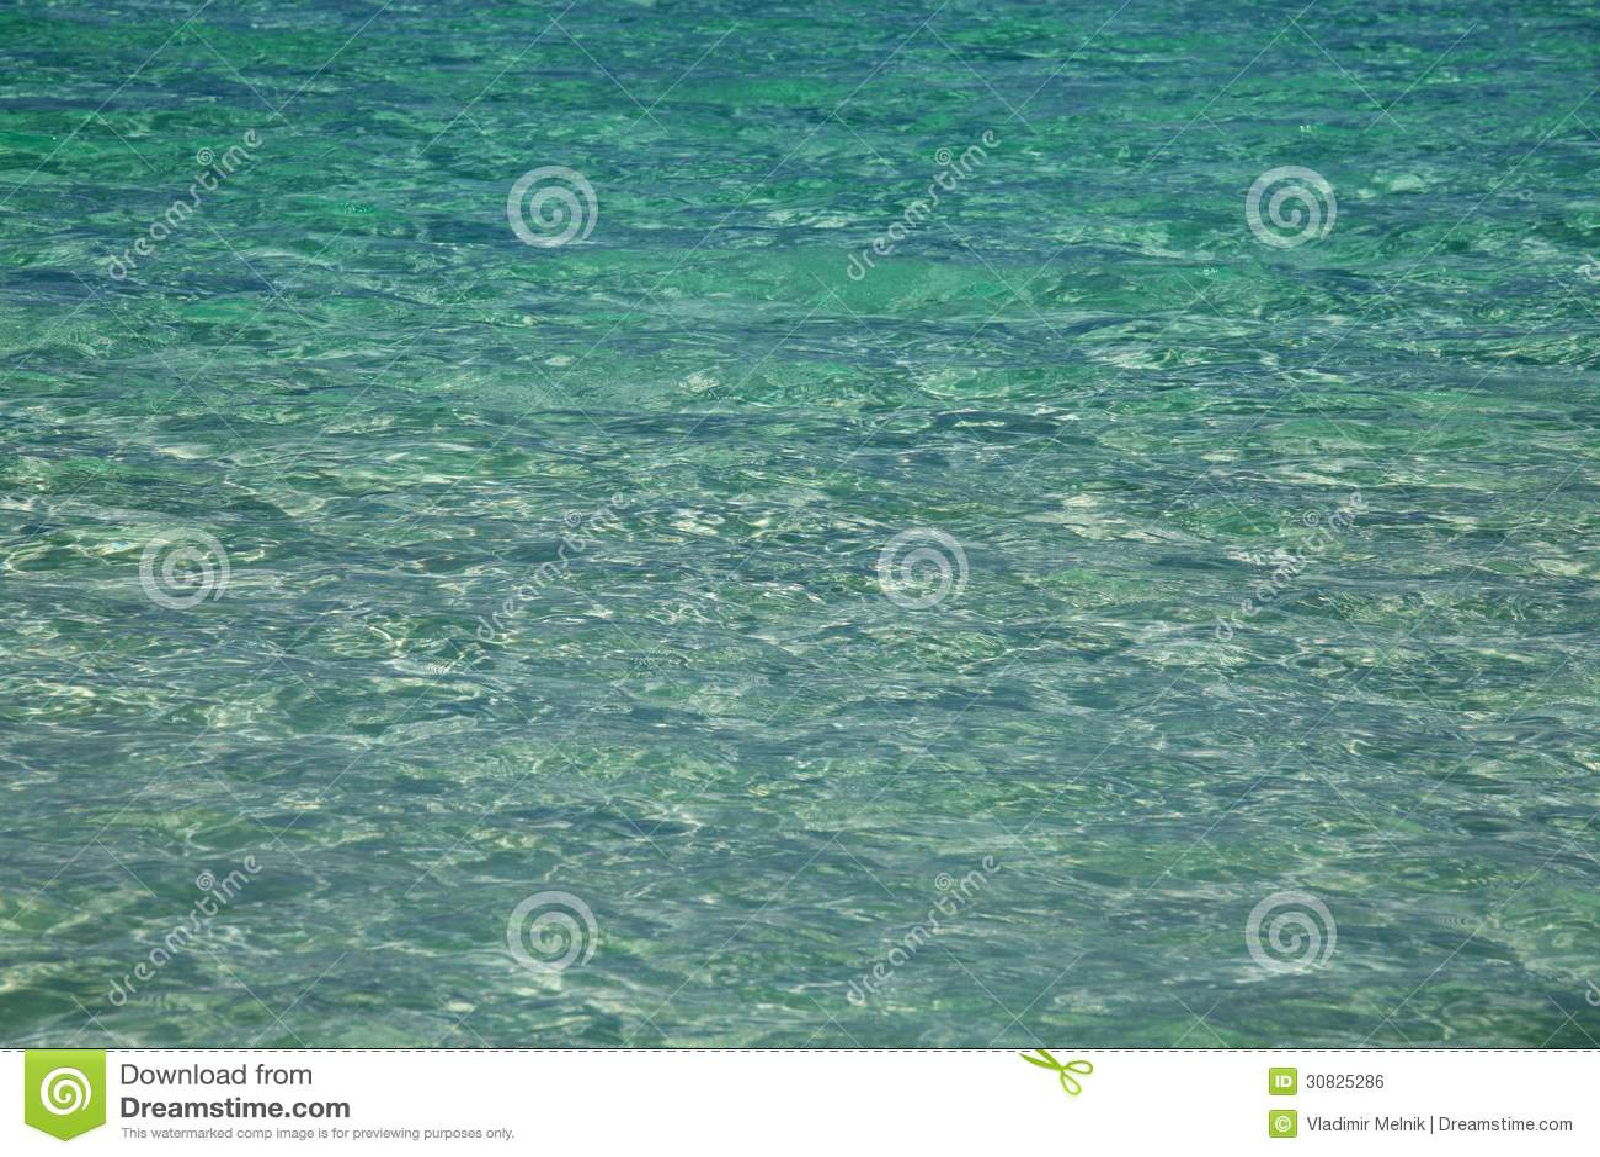 Superficie dell oceano